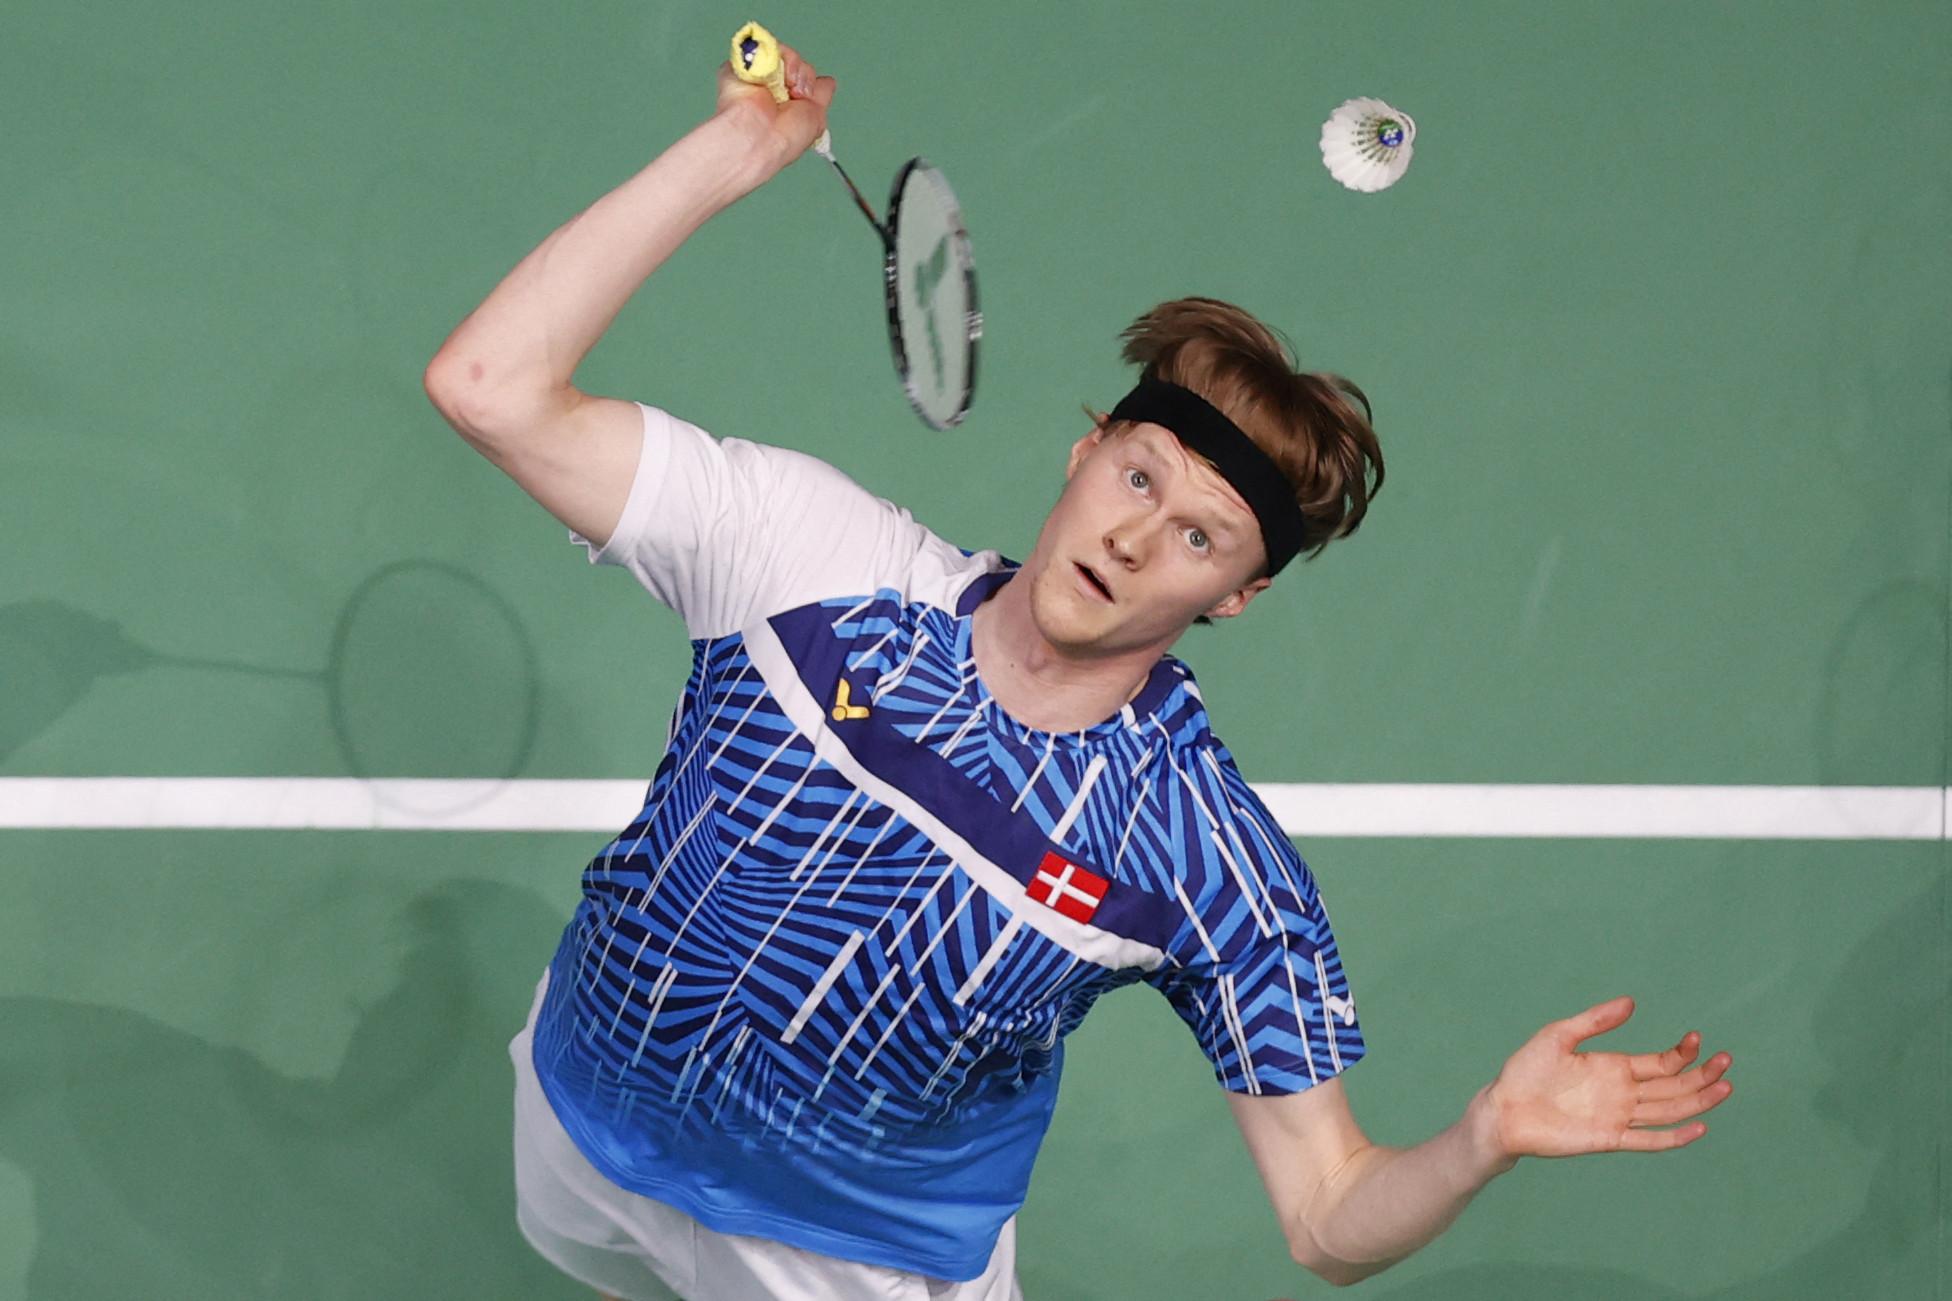 Danish pair dig deep to record comeback wins at European Badminton Championships